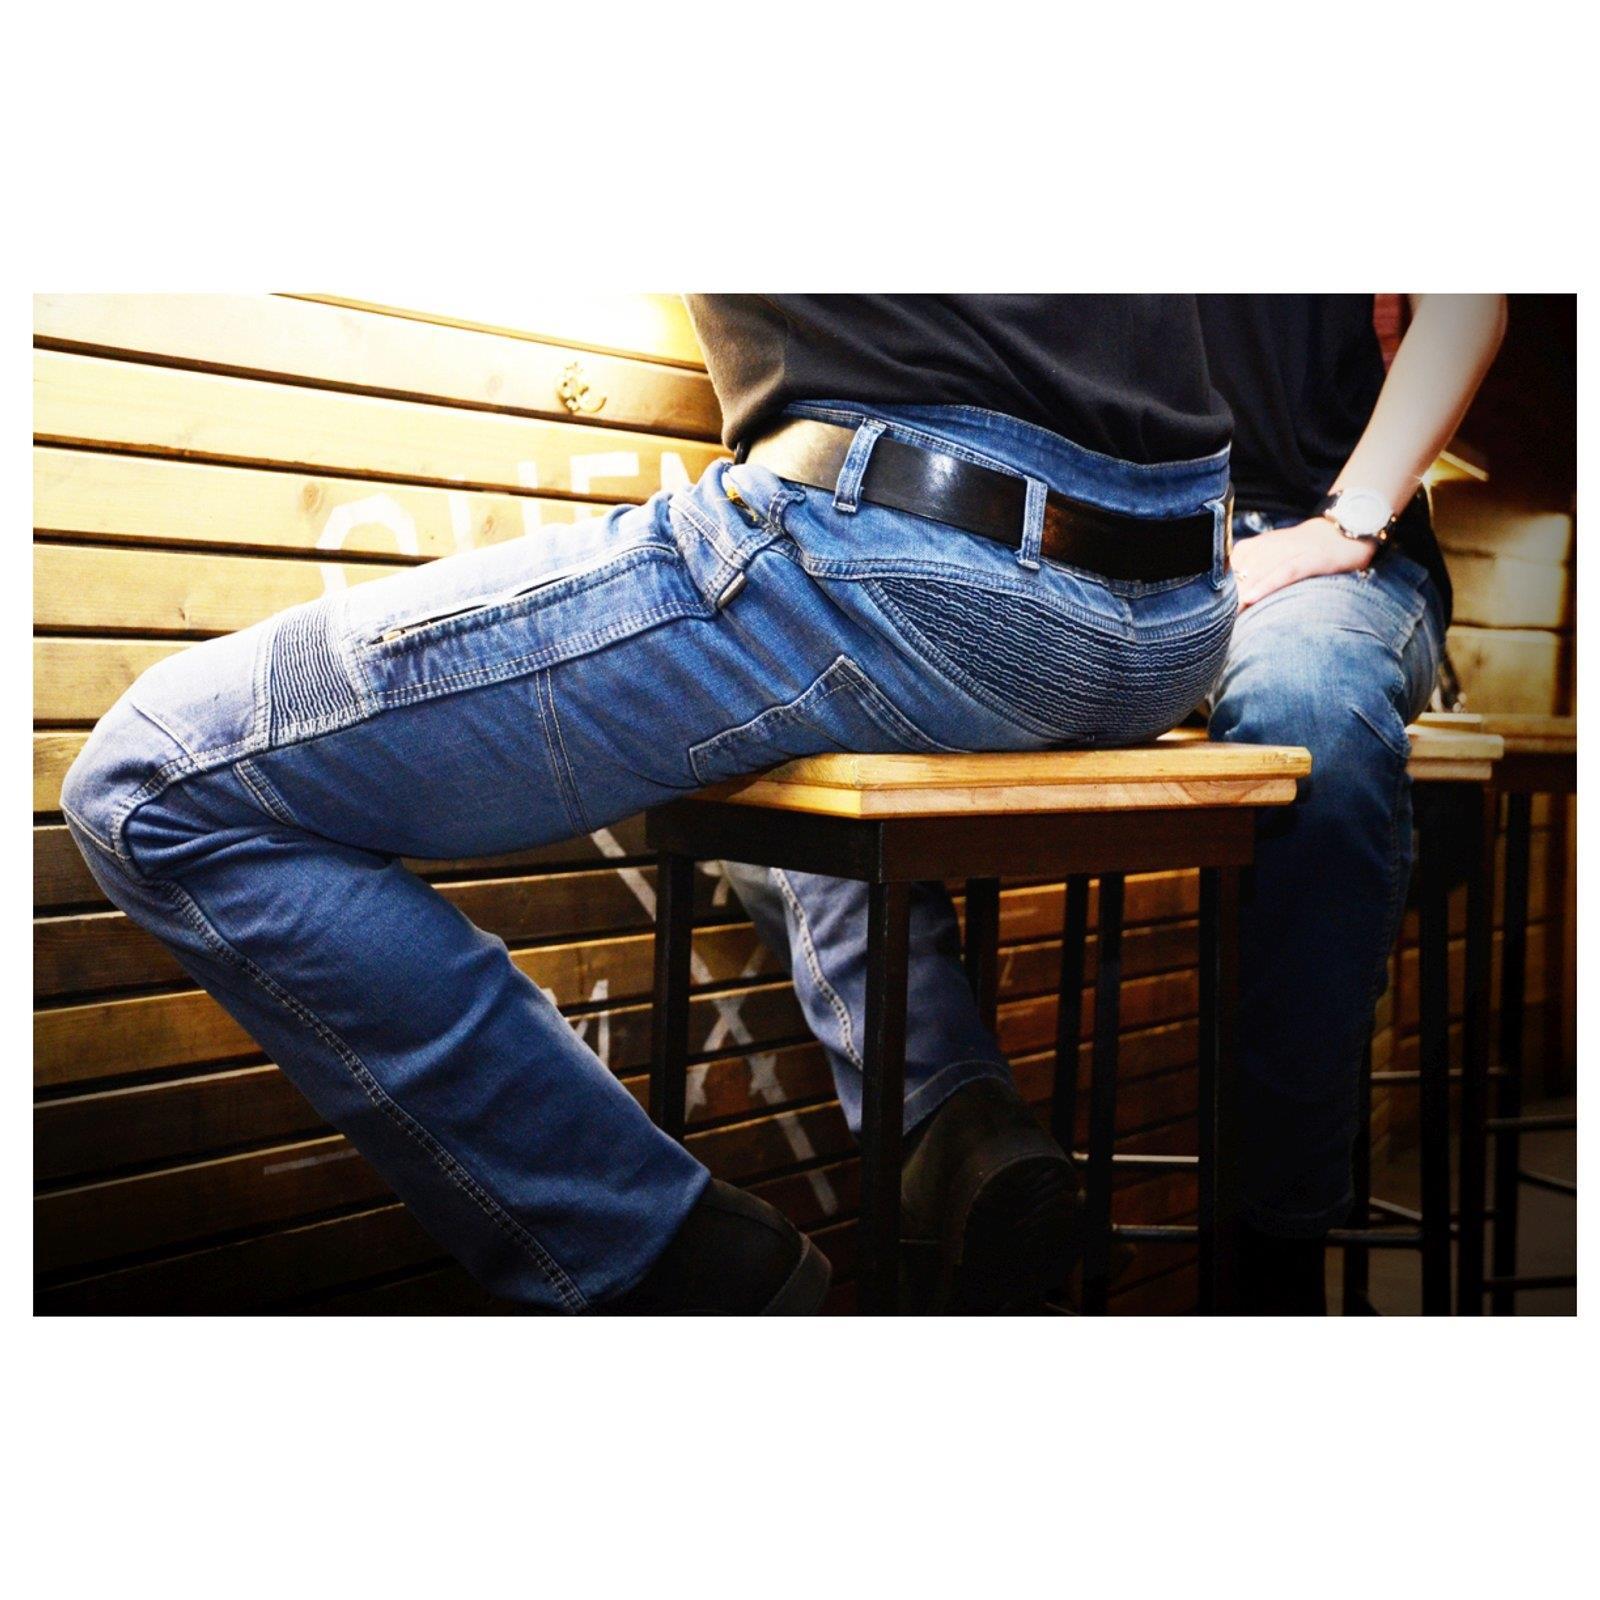 Trilobite-Pantaloni-Moto-Jeans-Abbigliamento-Parado-MICAS-URBAN-DUAL-PANTS-ACID miniatura 45